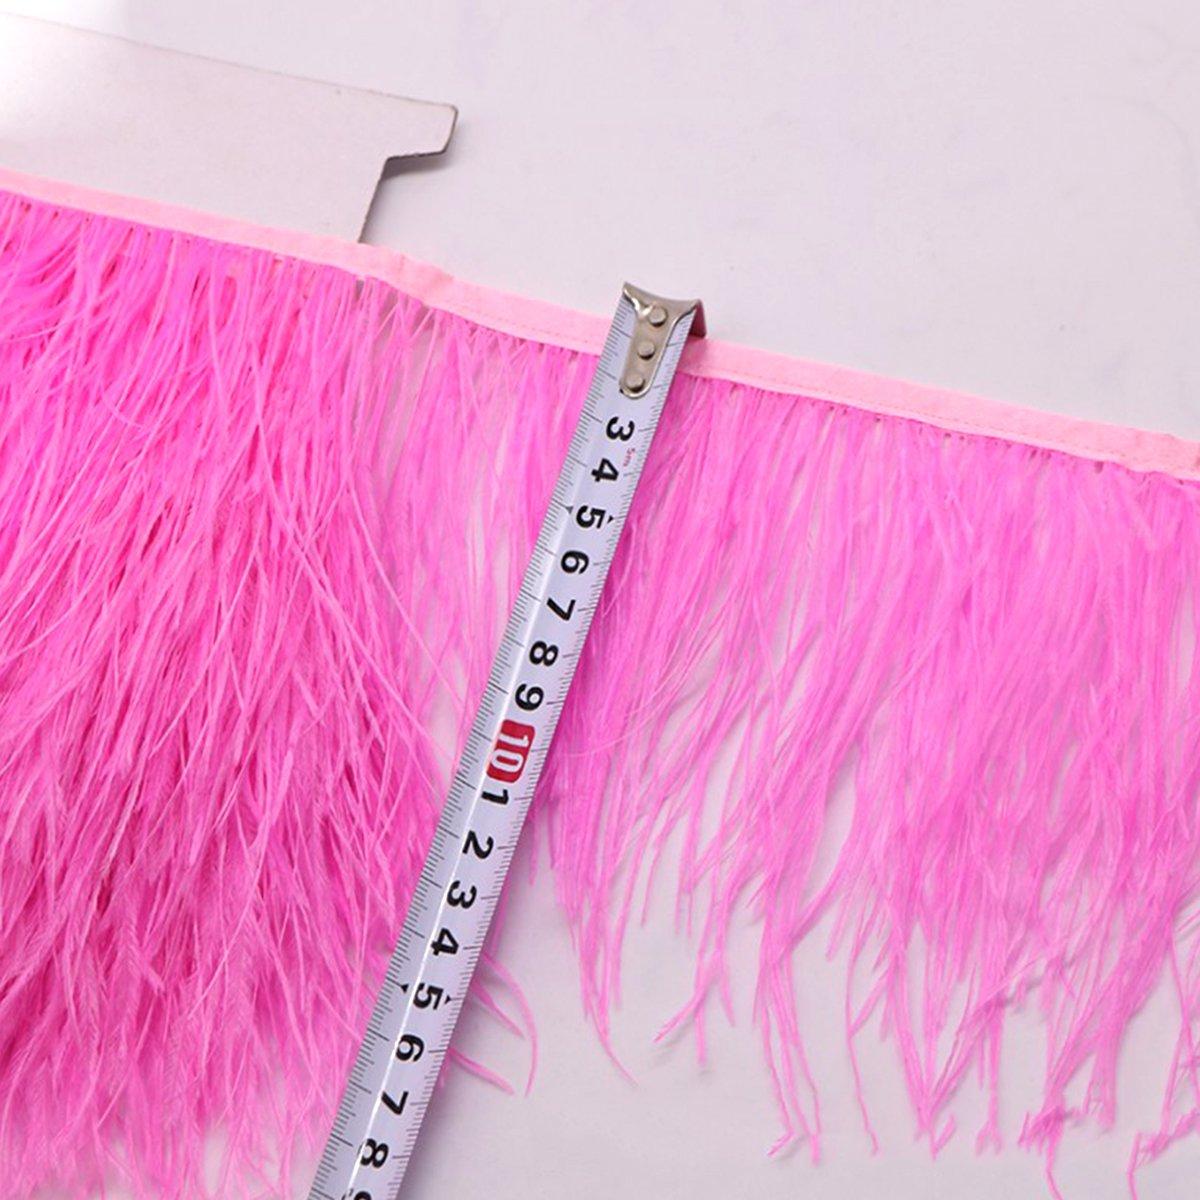 Rose Medium rosenice 2/m Ressort franges ruban autruche plumes Ressort pour v/êtements DIY Couture Artisanat